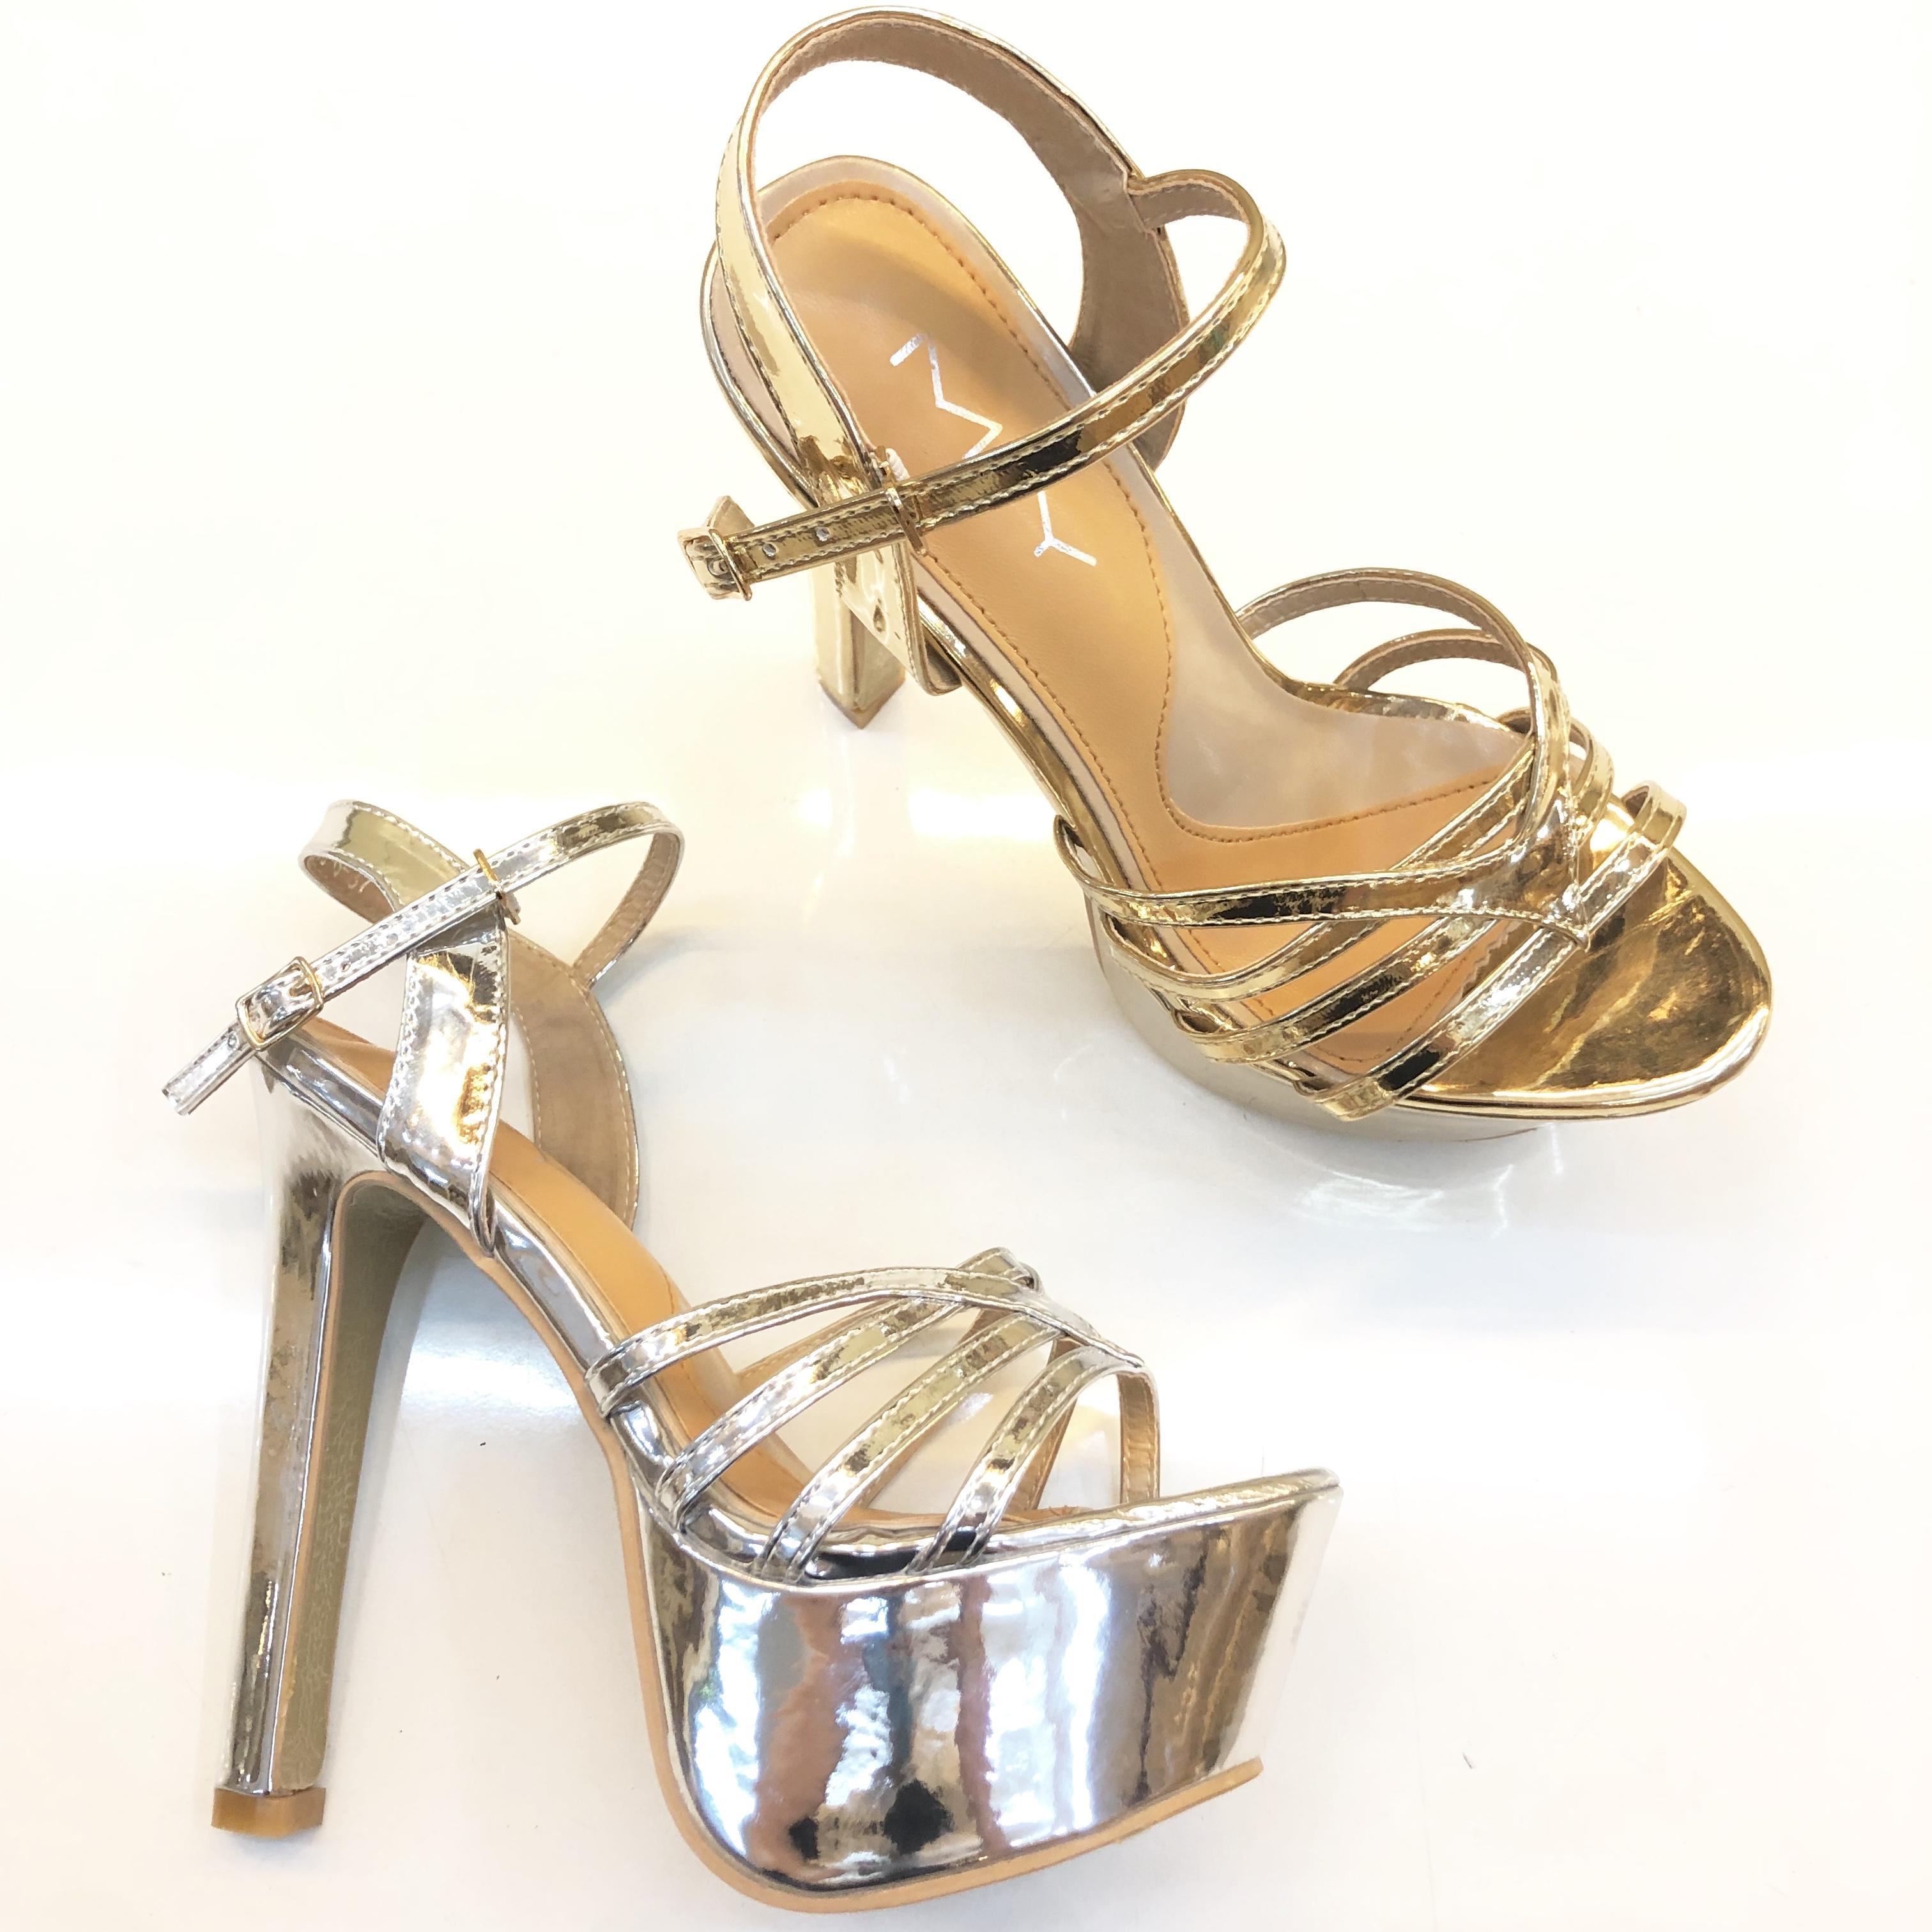 DS Korean Best seller Summer Women Fashion High Heel Peep Toe Platform  Stiletto Ankle Crisscross Strap 831804f4c538